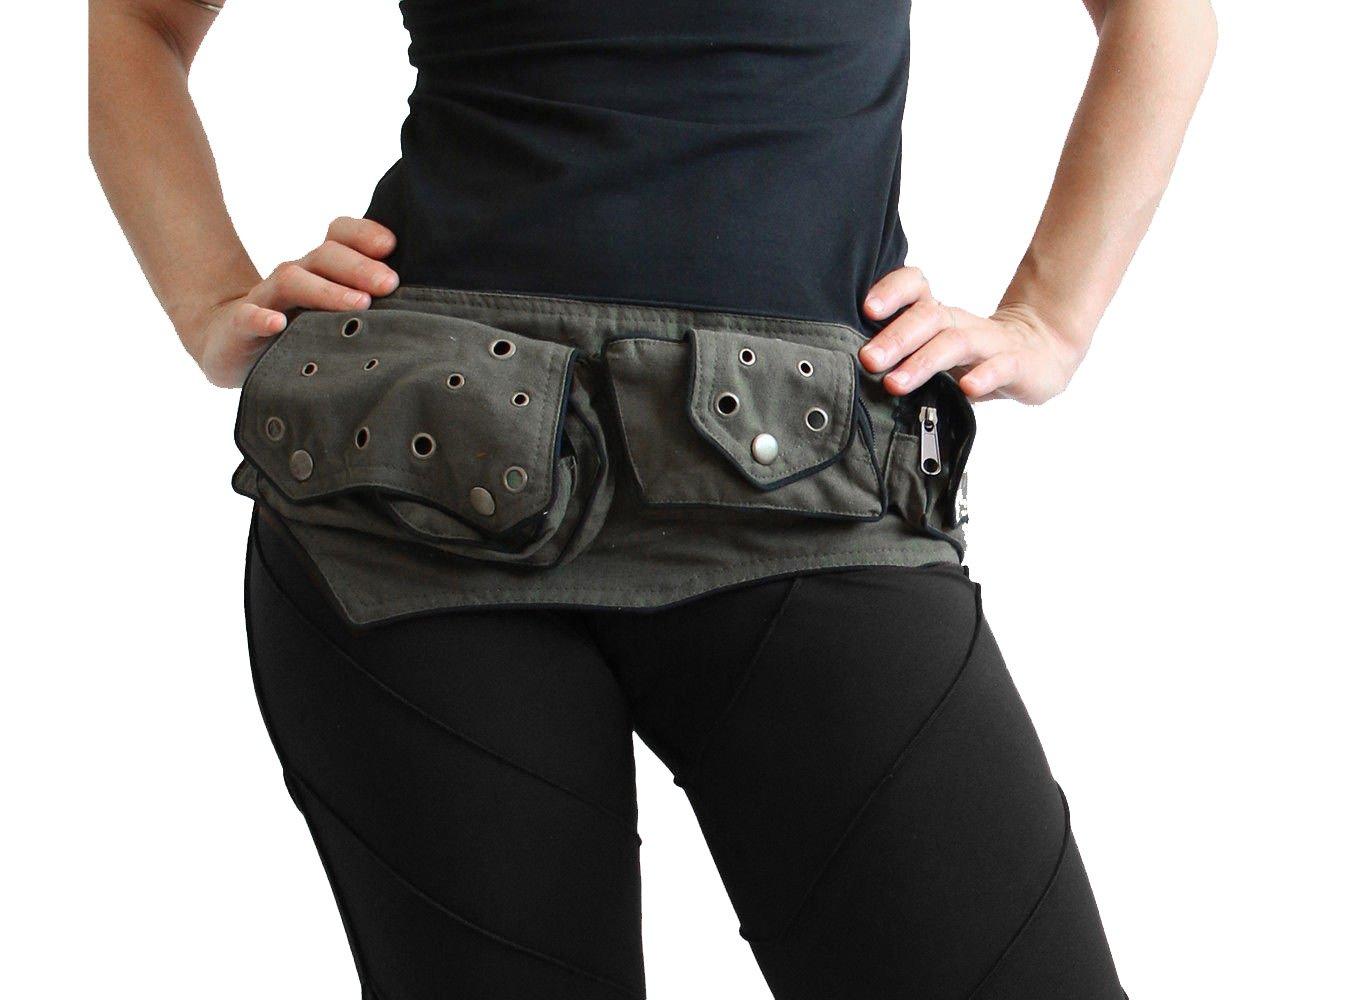 manakamana Utility pocket, belt bag, Olive green, wool